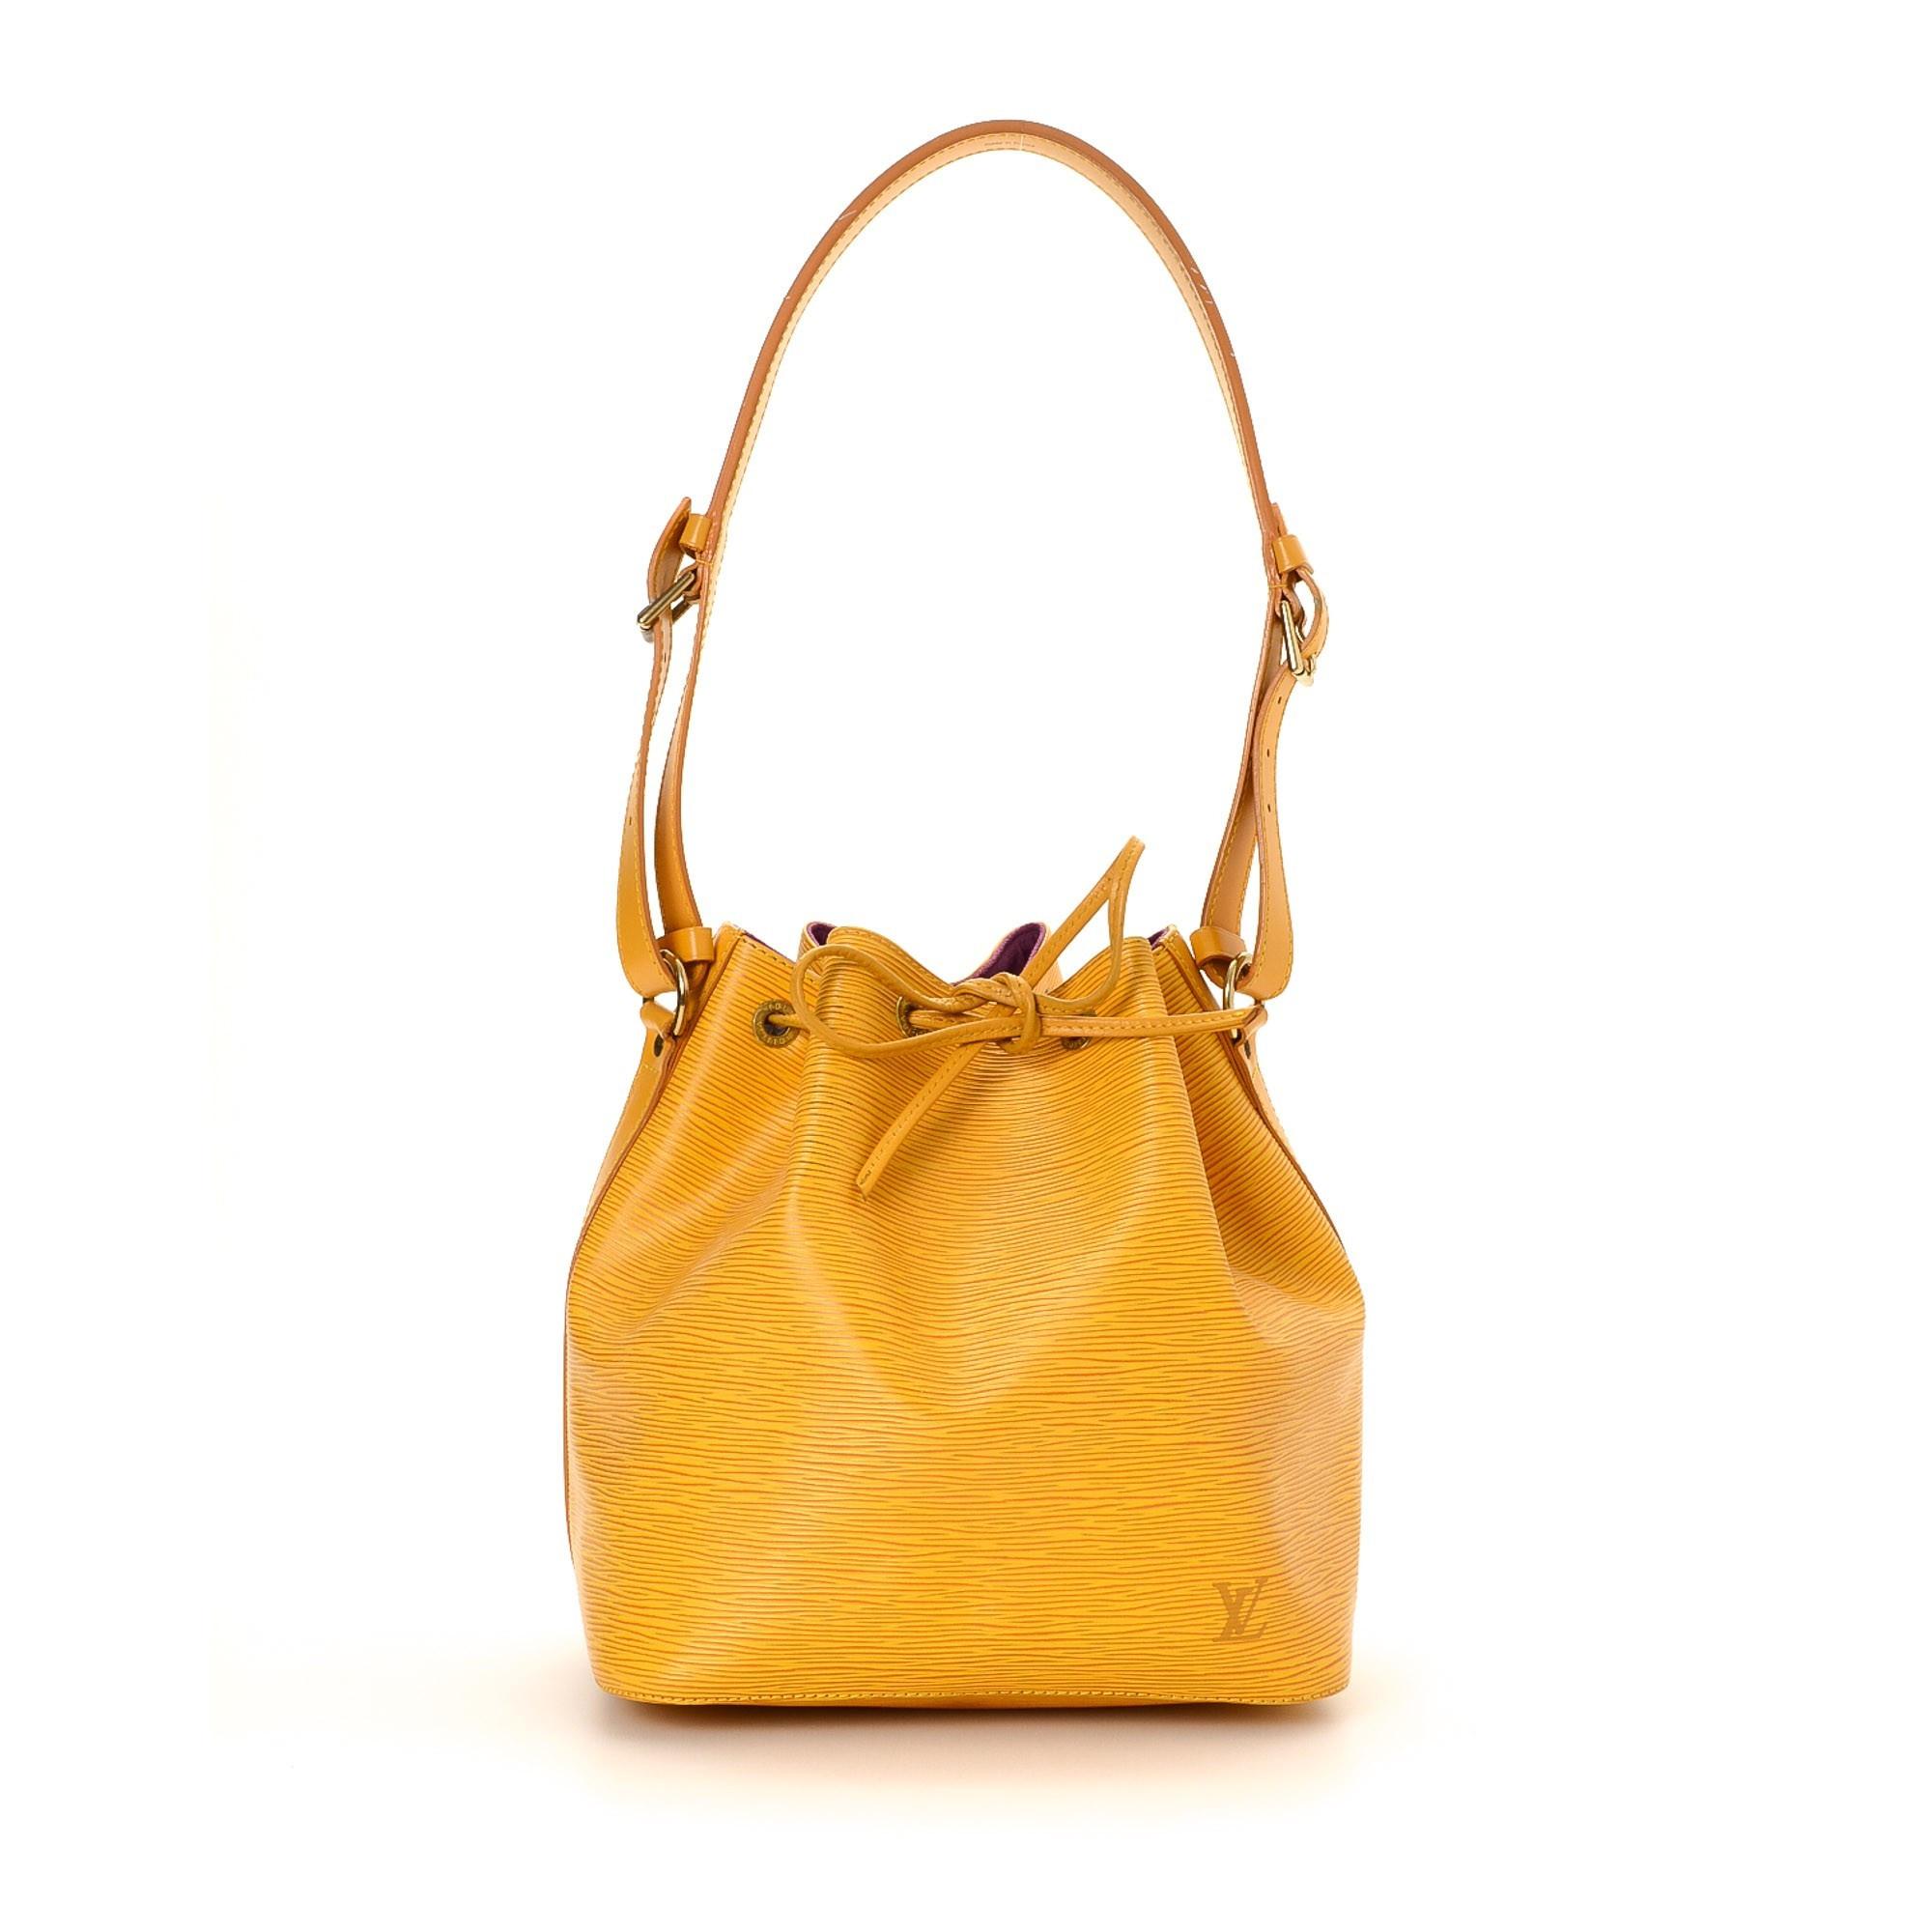 Louis Vuitton Petit Noe Epi Yellow Leather Shoulder Bag LXRCO